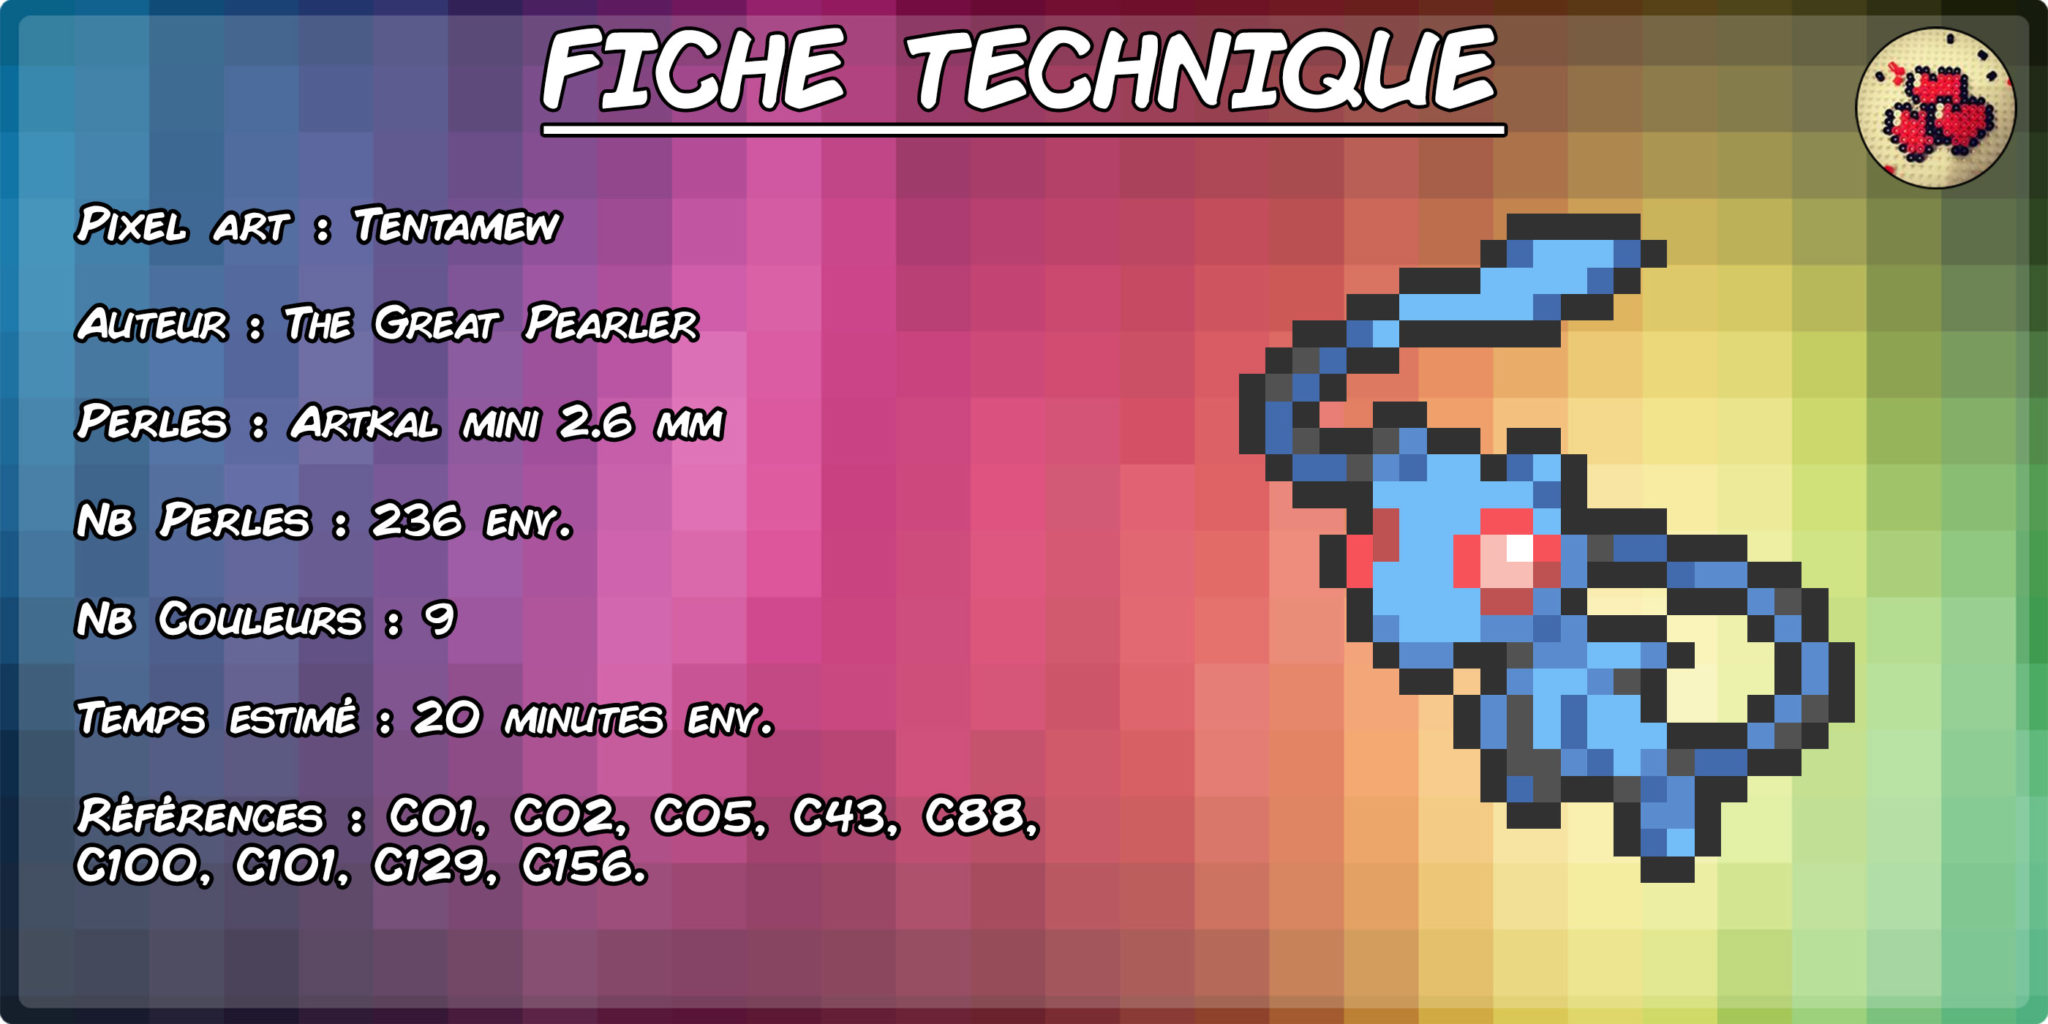 mew-tentacruel-tentamew--fiche-pokefusion-pokemon-pixel-card-pixelart-pixelcraft-pixelbeads-perlerbeads-perlerart-hama-hamabeads-hamasprites-artkal-artkalbeads-fusebeads-retro-gaming-sprite-design-tutoriel